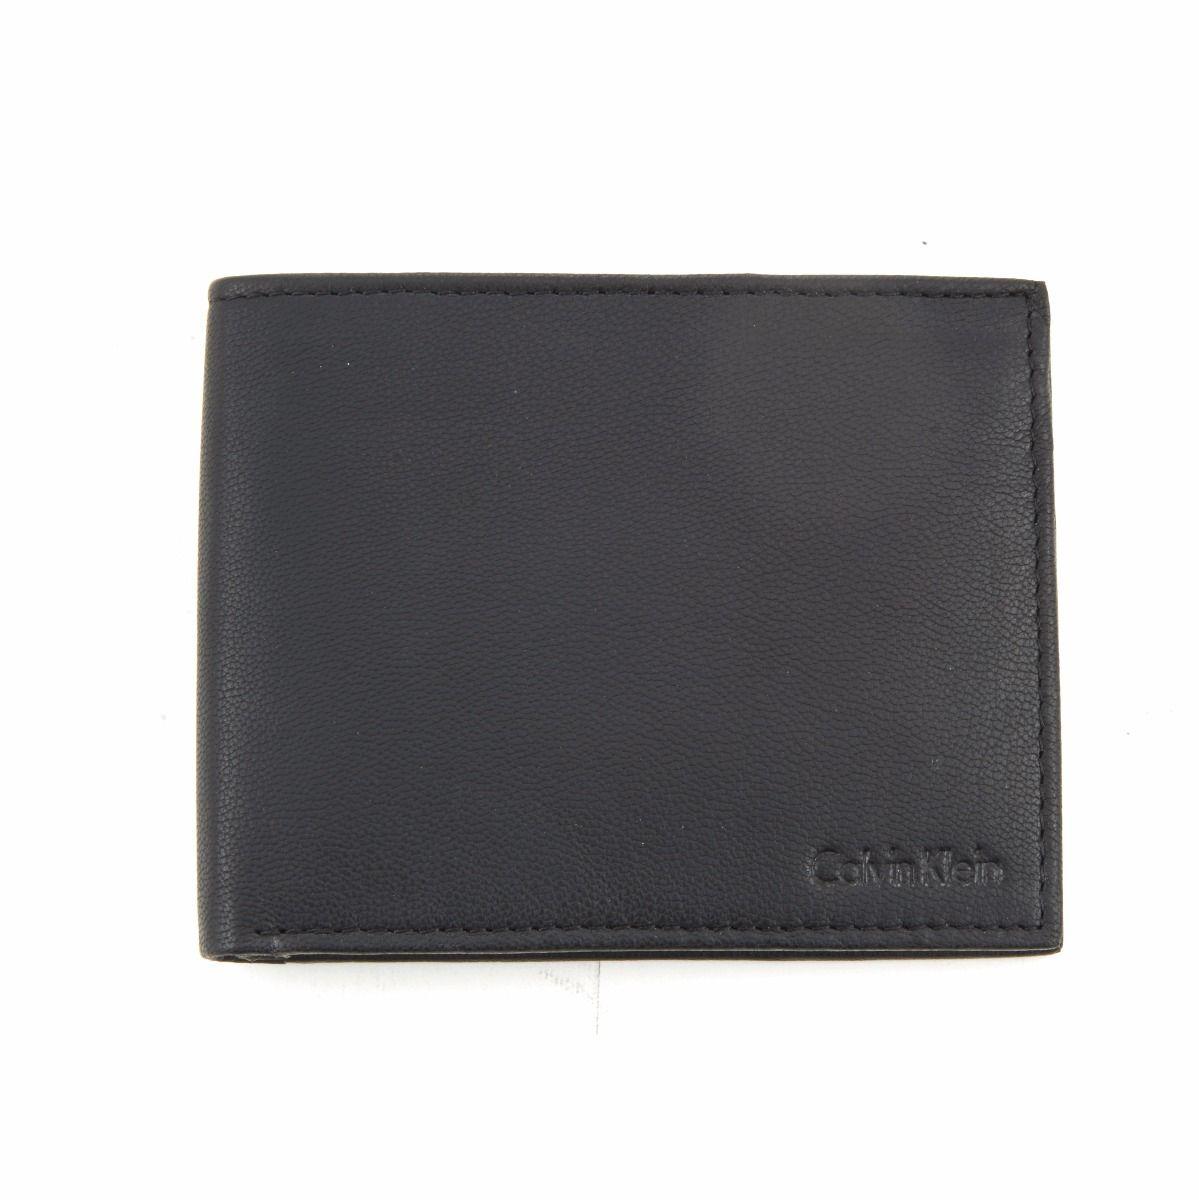 Calvin Klein Men's Bi-fold Leather Wallet Black